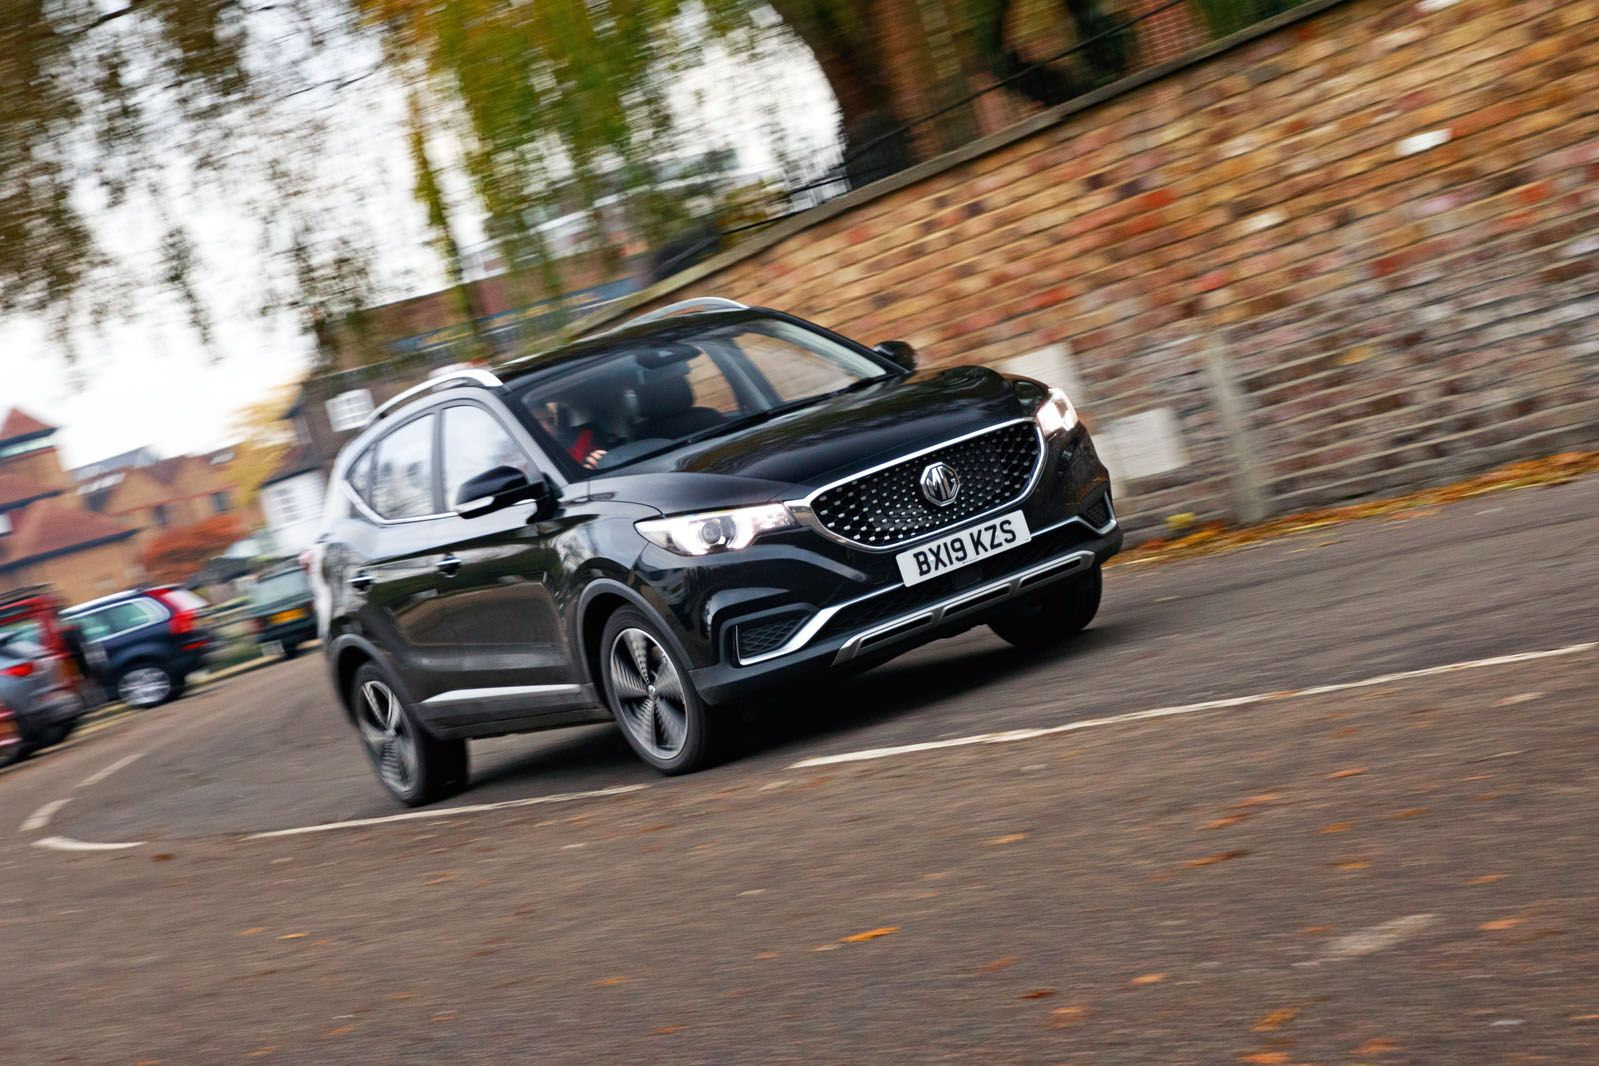 Mg Zs Ev 2020 Long Term Review In 2020 Car Review Automotive Car